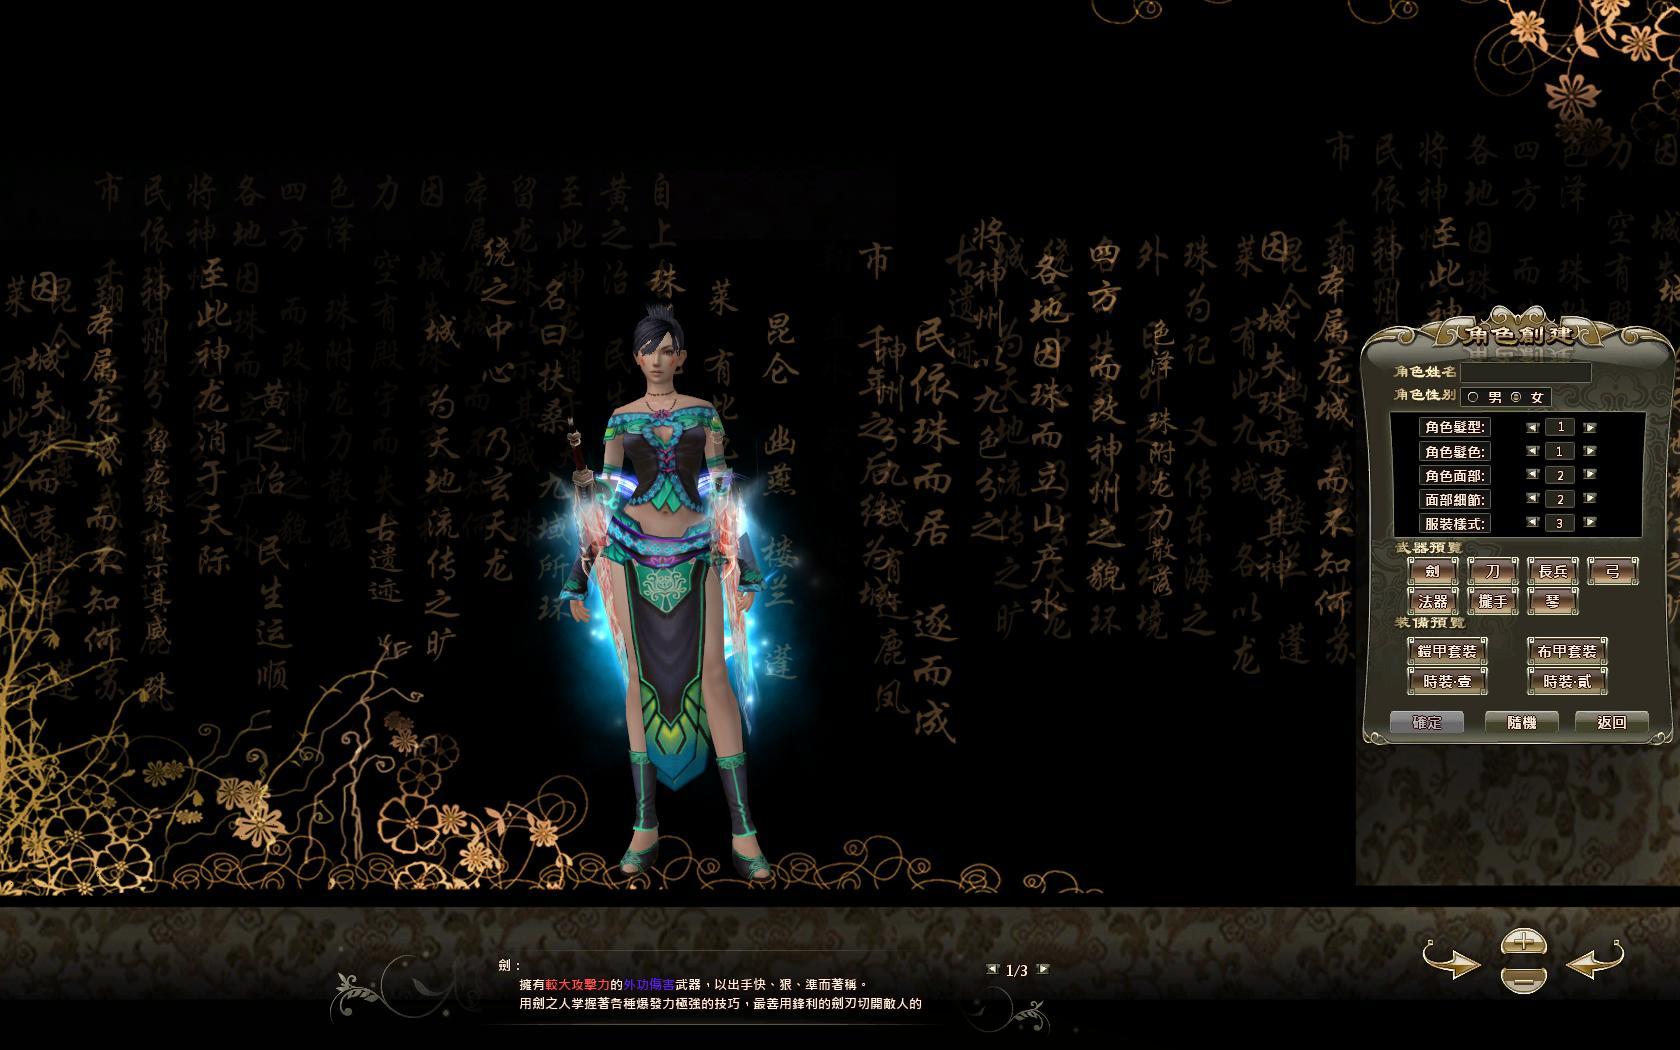 LoongScreenshot[10-7-2010 225204]-38229357